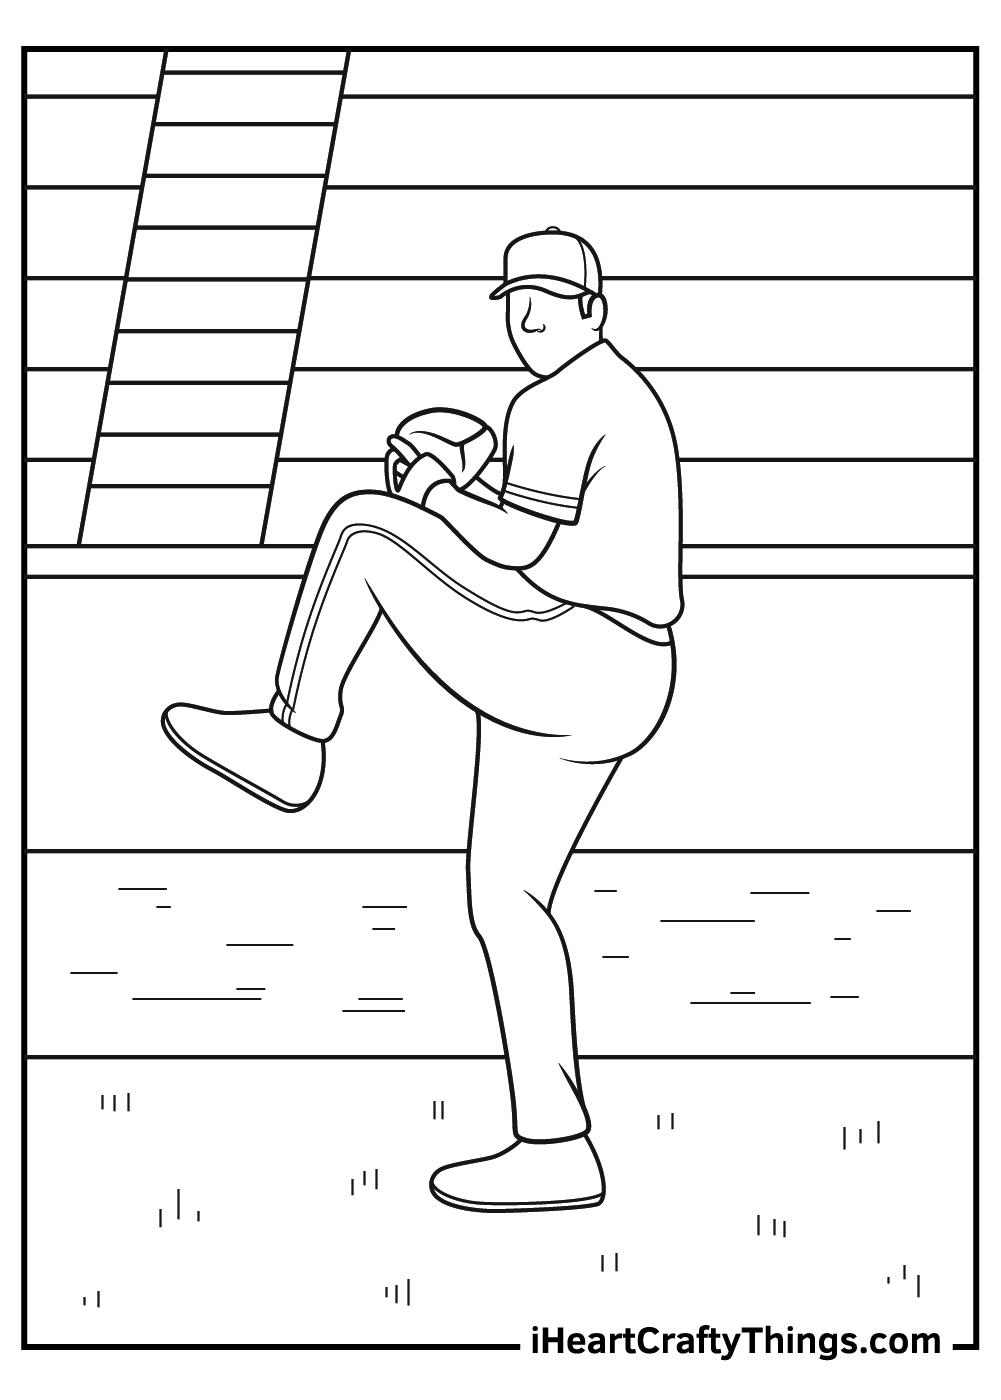 yankee baseball coloring pages